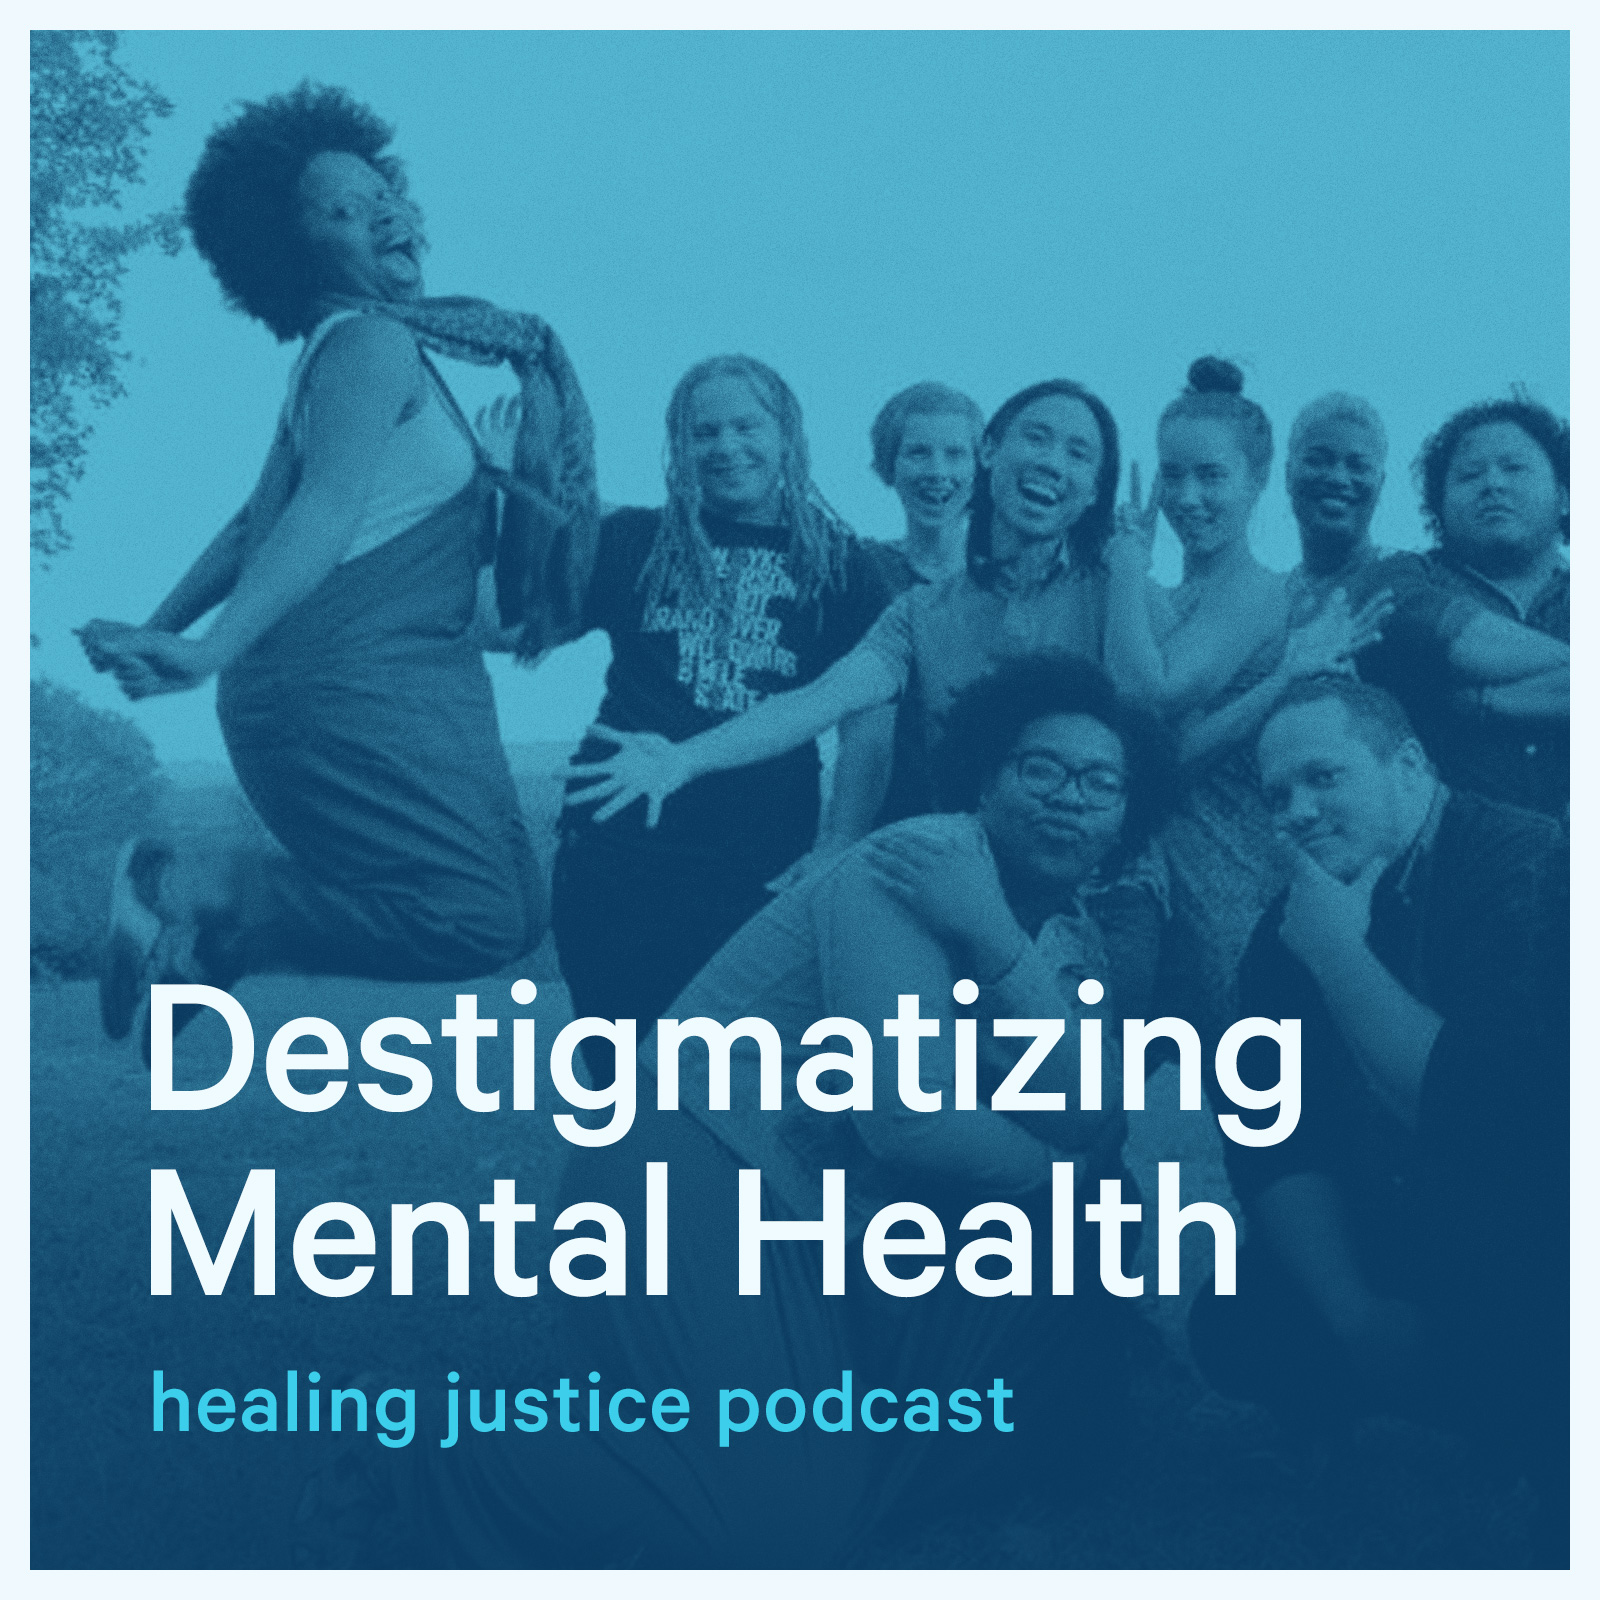 s2e2_Destigmatizing_Mental_Health.jpg